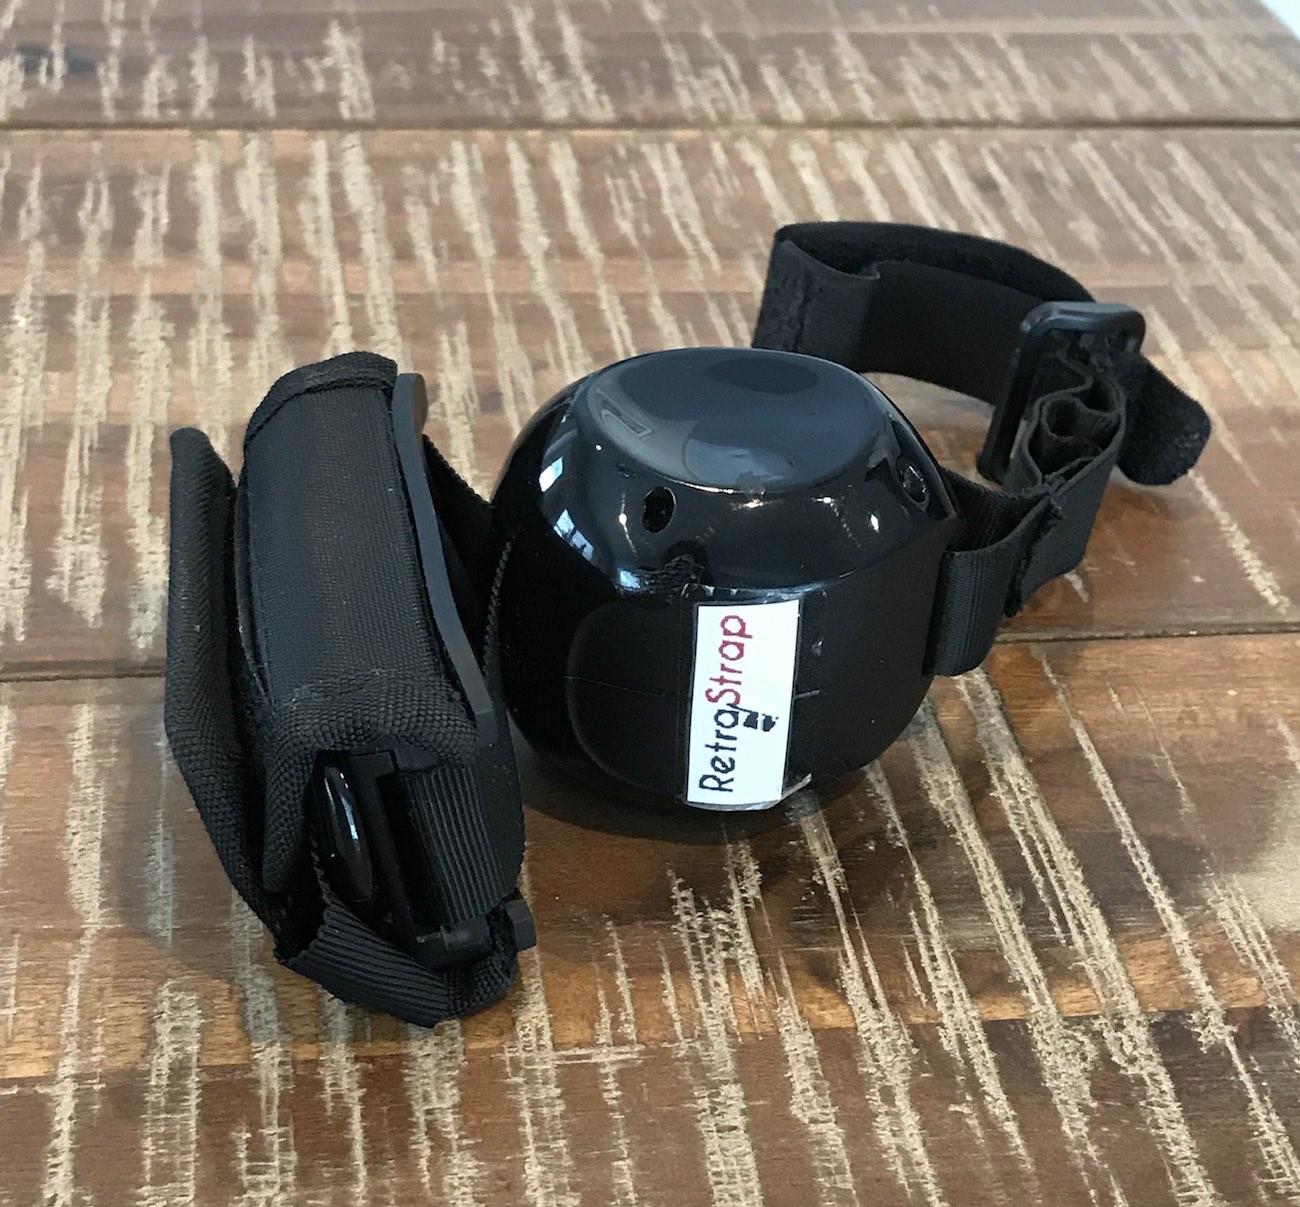 RetraStrap Anti-Theft Hands-Free Retractable Bag Strap